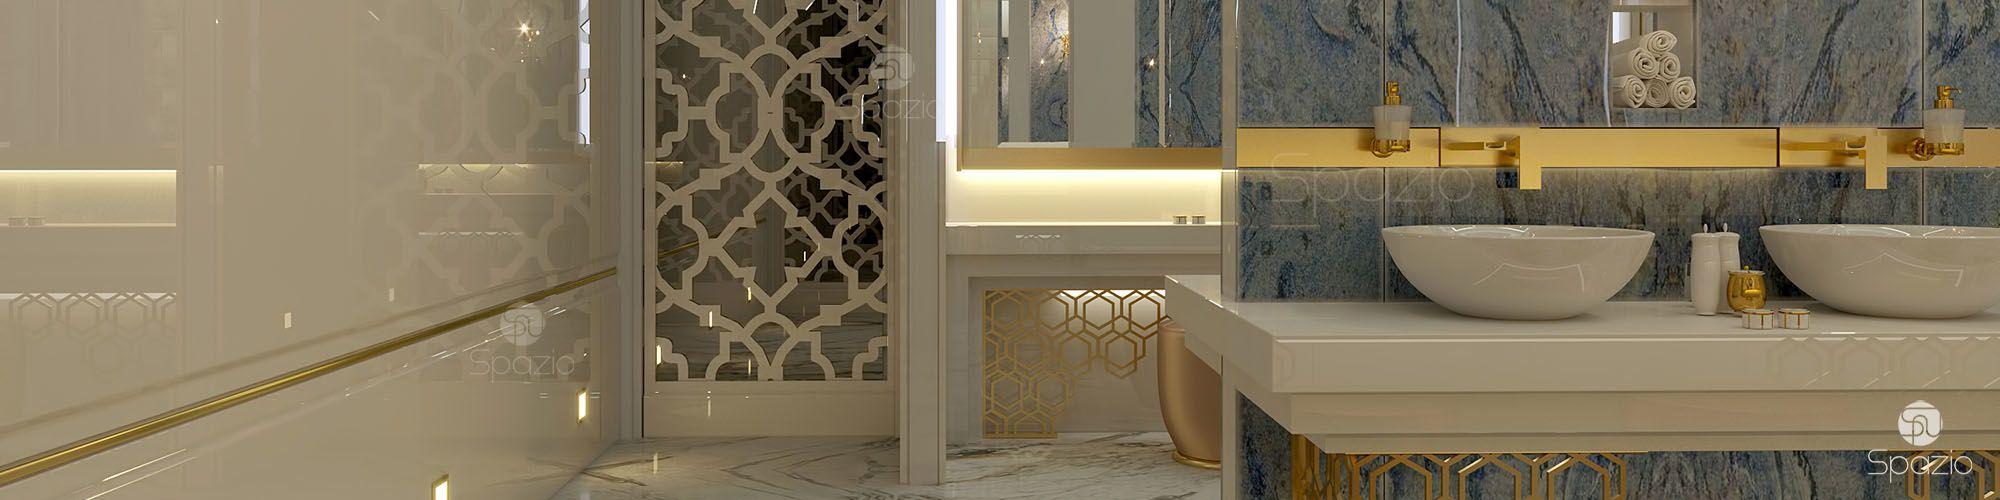 Bathroom design dubai uae spazio for Bathroom designs dubai